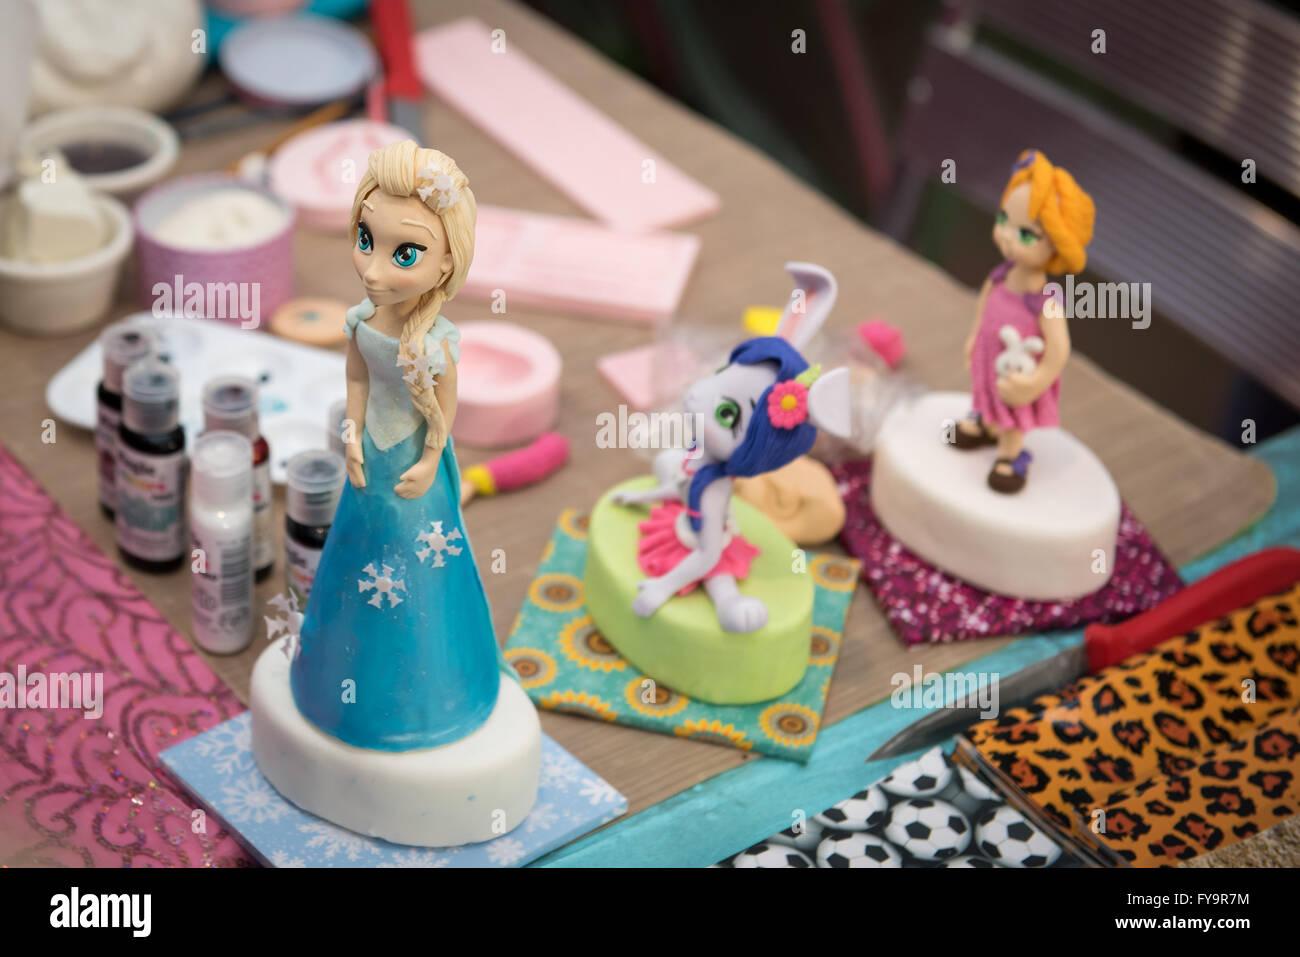 Frozen Elsa Birthday Cake Decoration At Cake International The